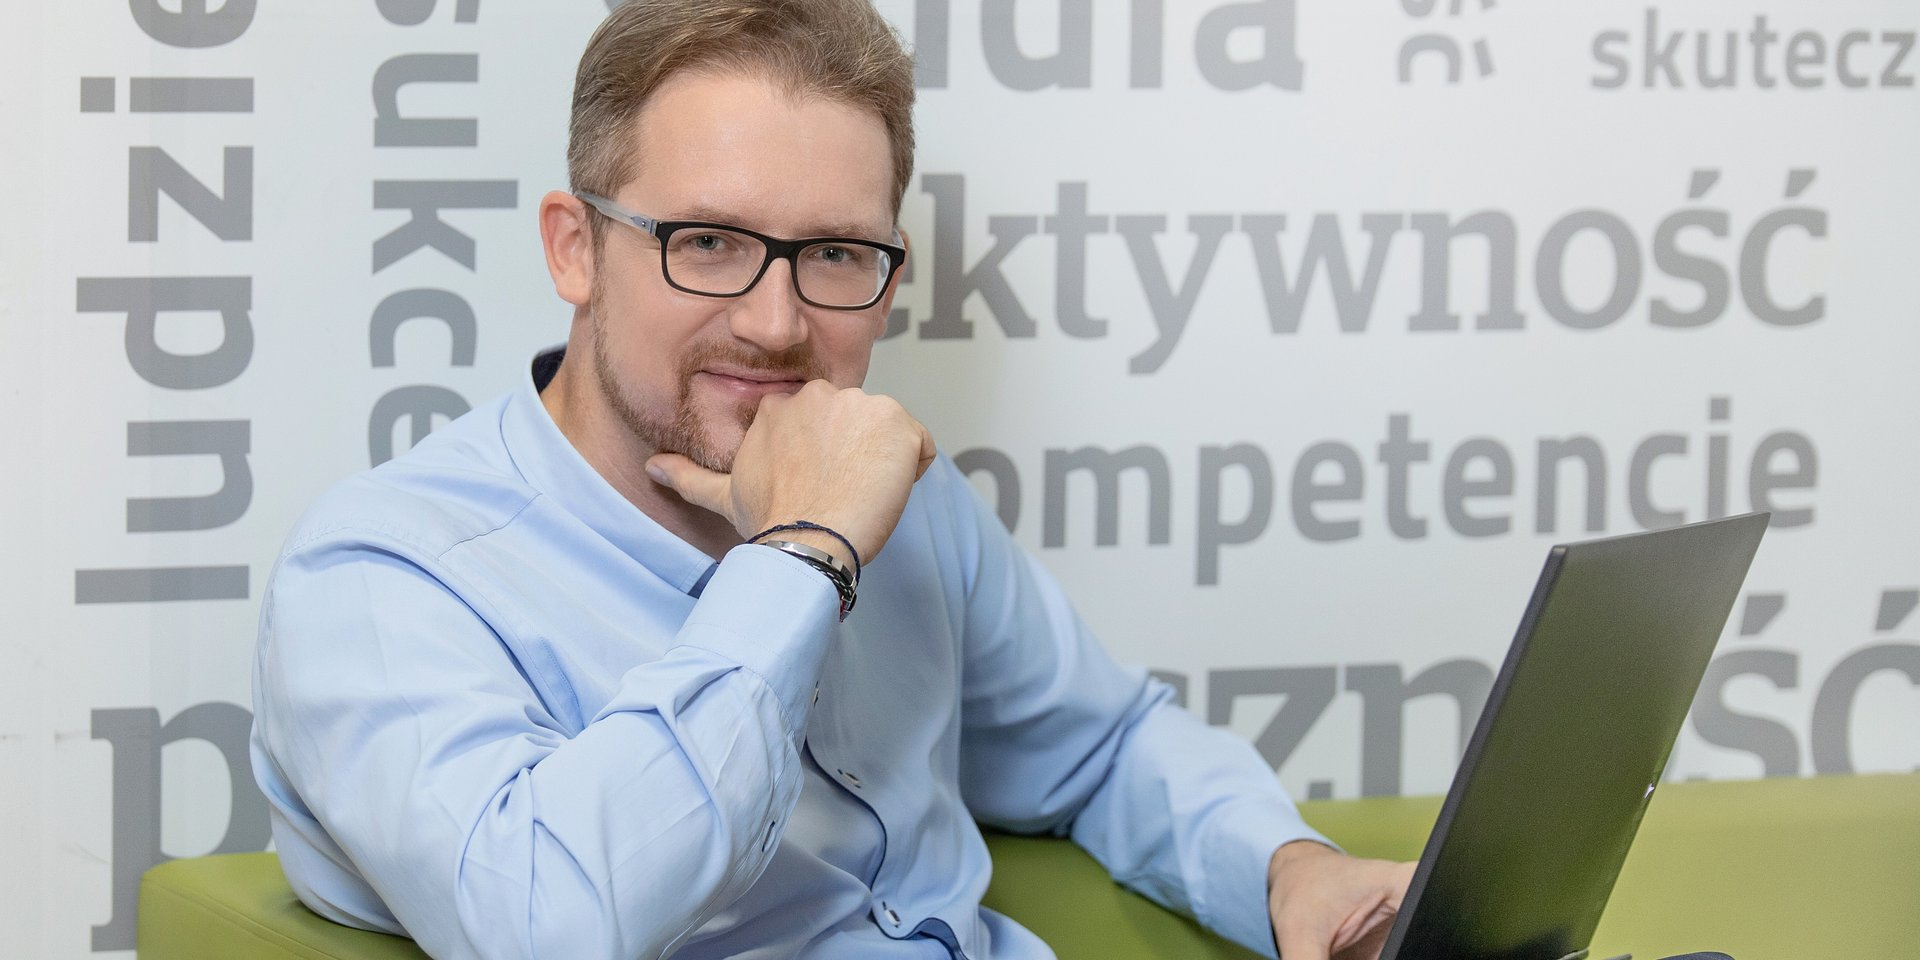 e-learning: Tomasz Jankowski